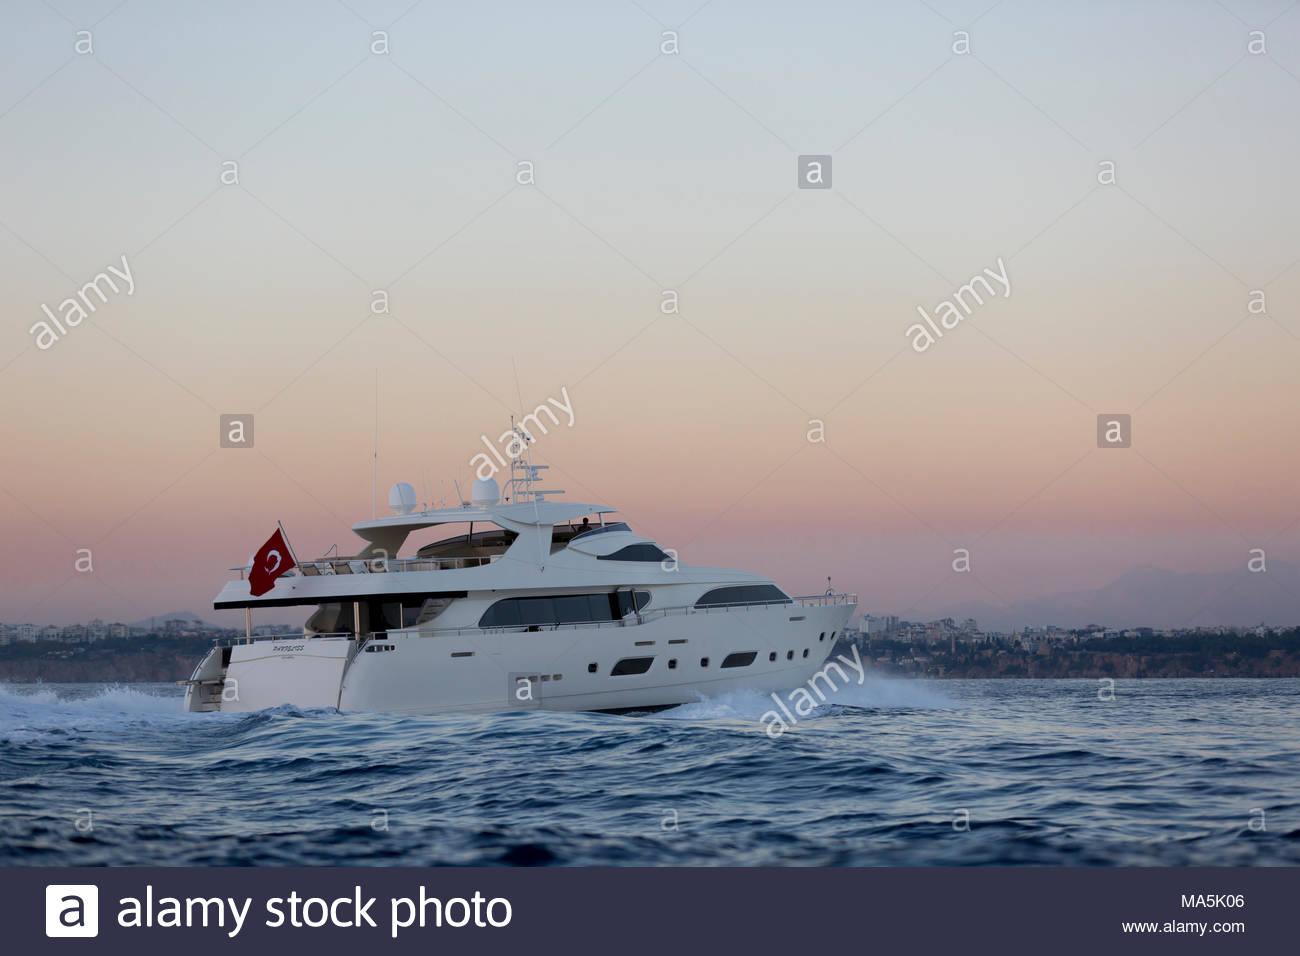 Luxury yacht sailing on the sea sunset - Stock image Yacht, Sunset, Nautical Vessel, Sun, Luxury - Stock Image